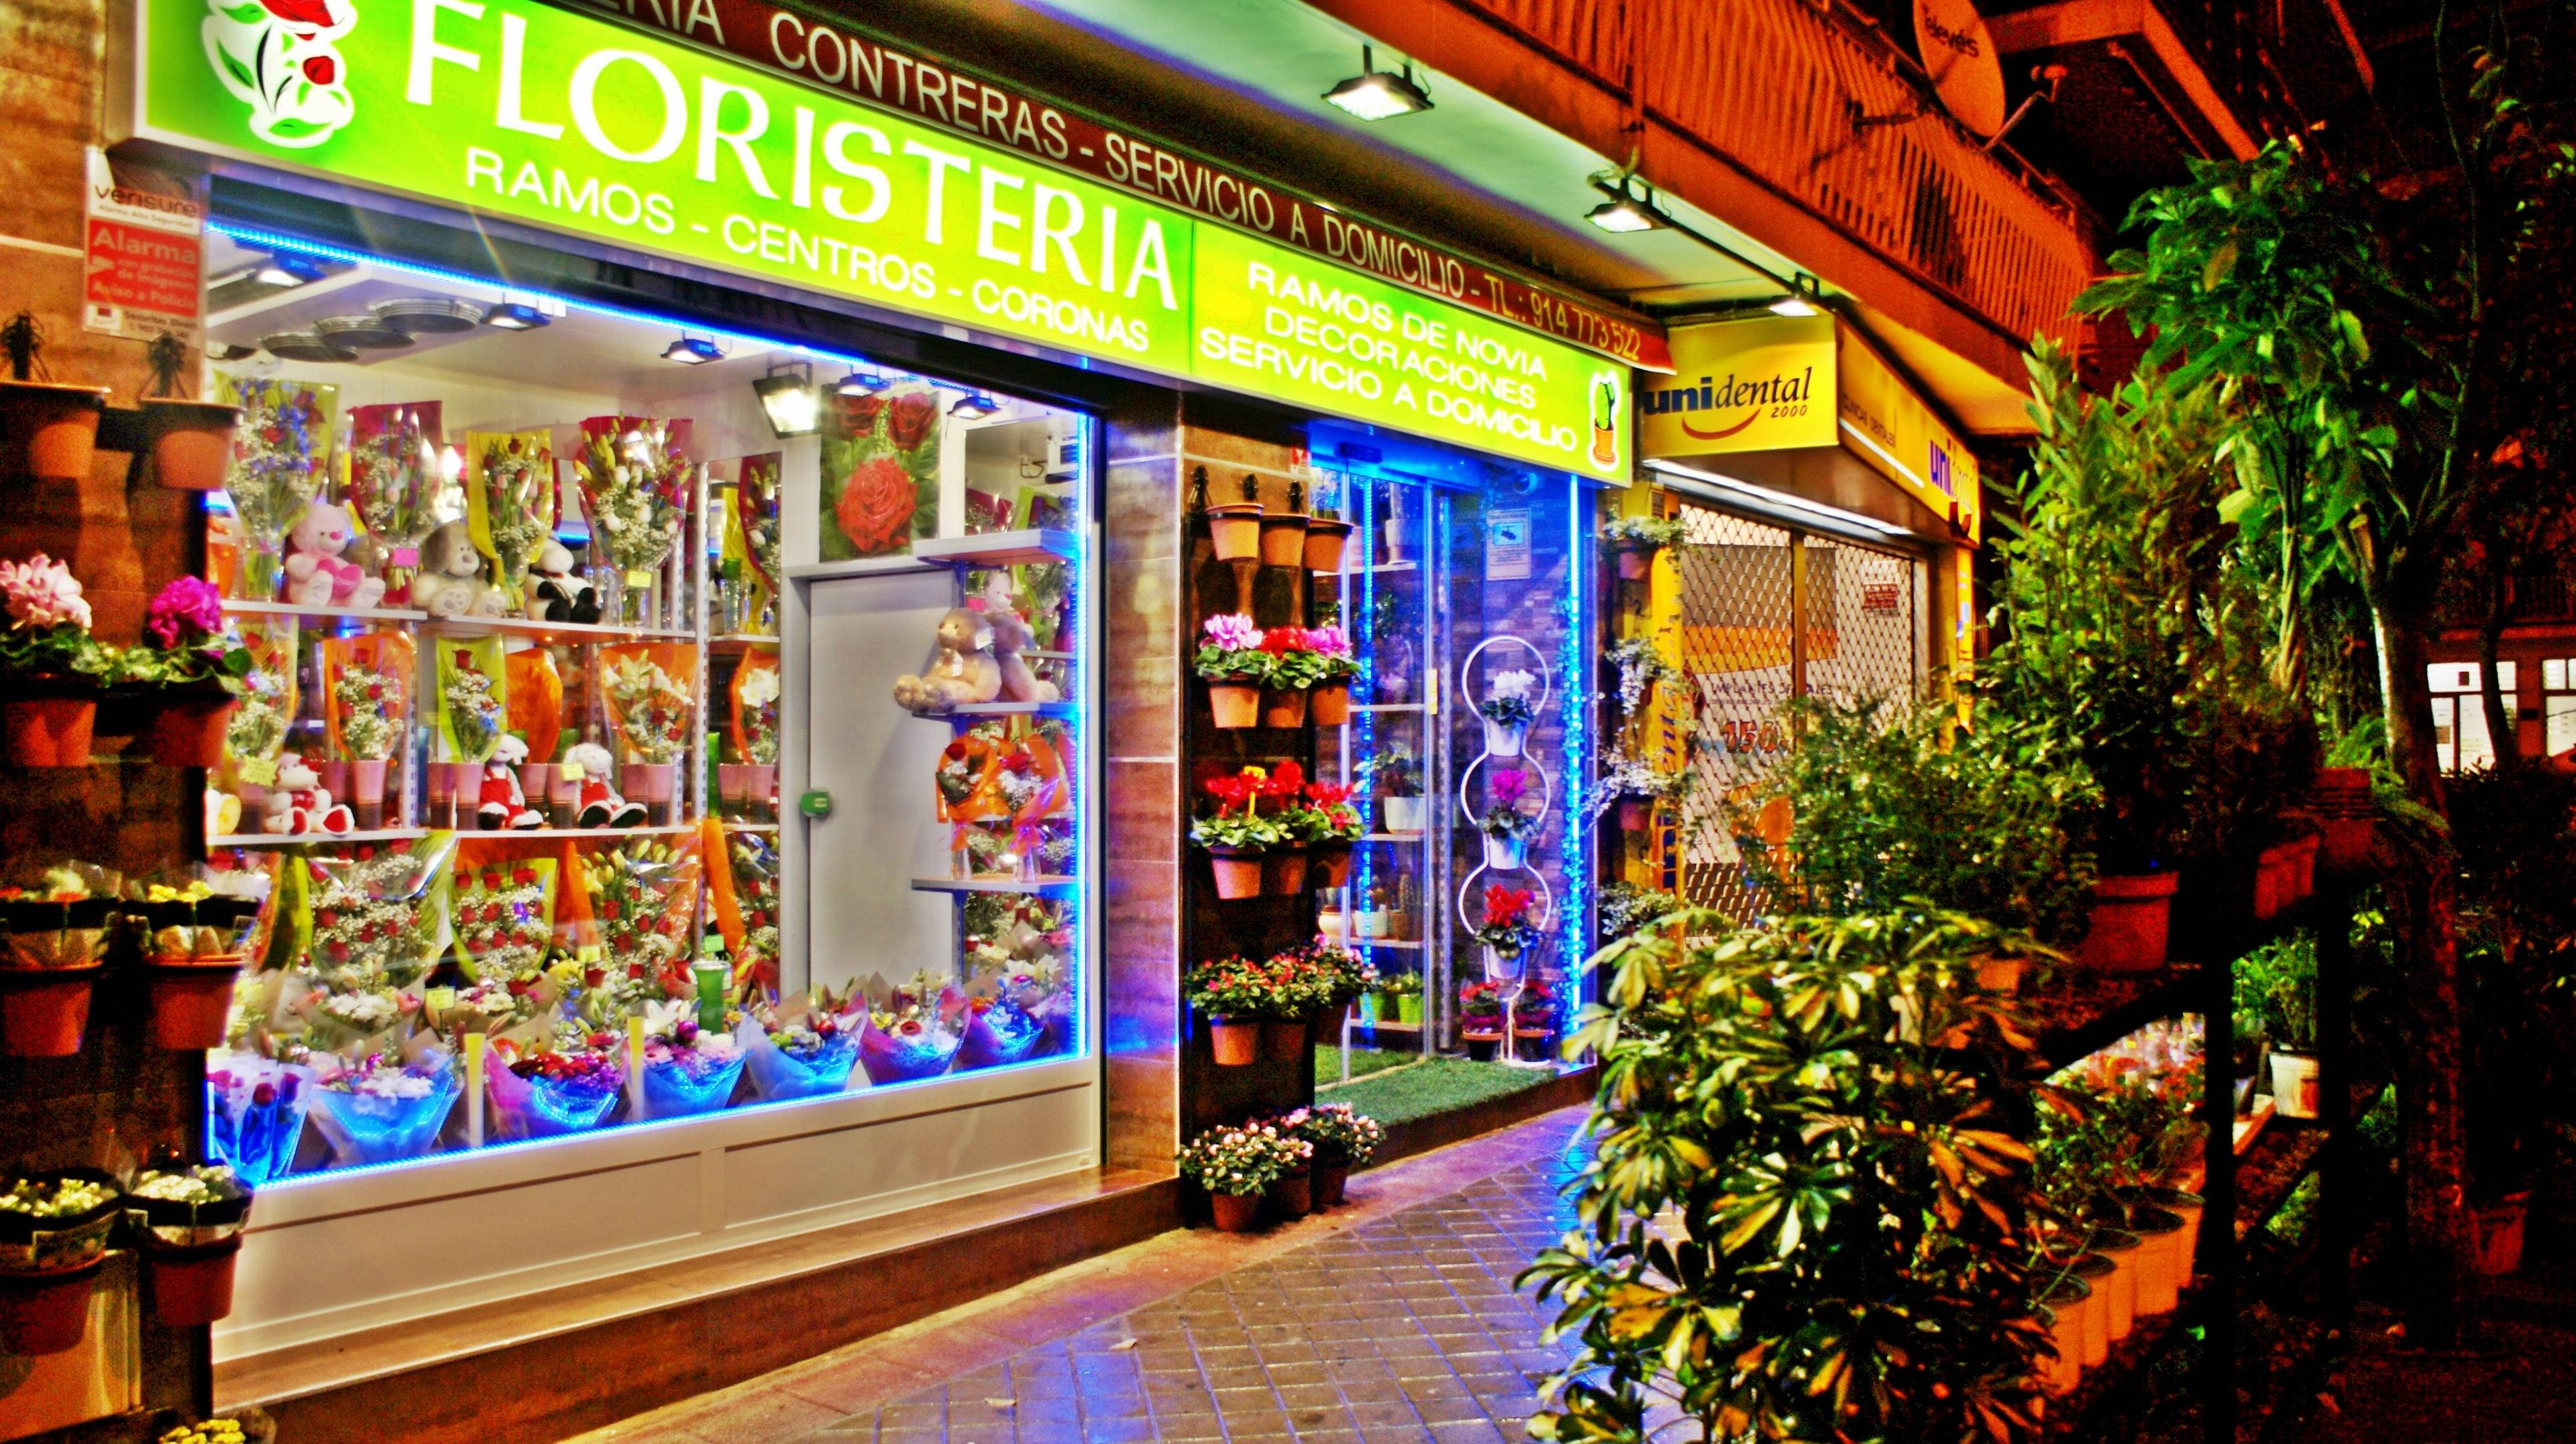 Foto 3 de Floristerías en Madrid | Floristería Contreras